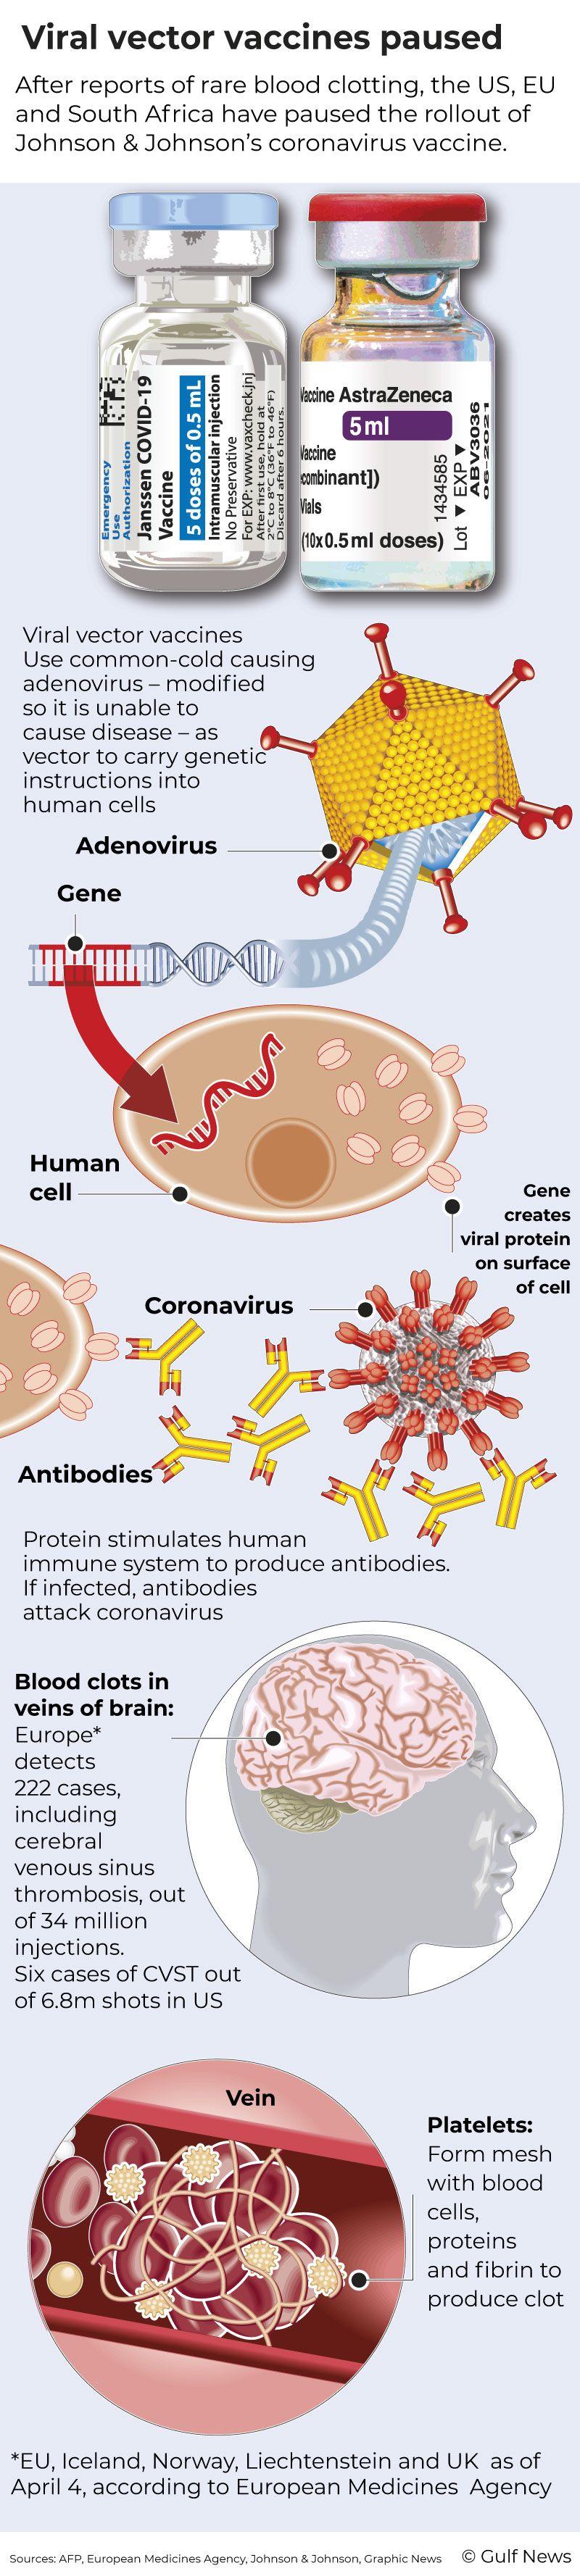 Graphic Vector virus vaccines